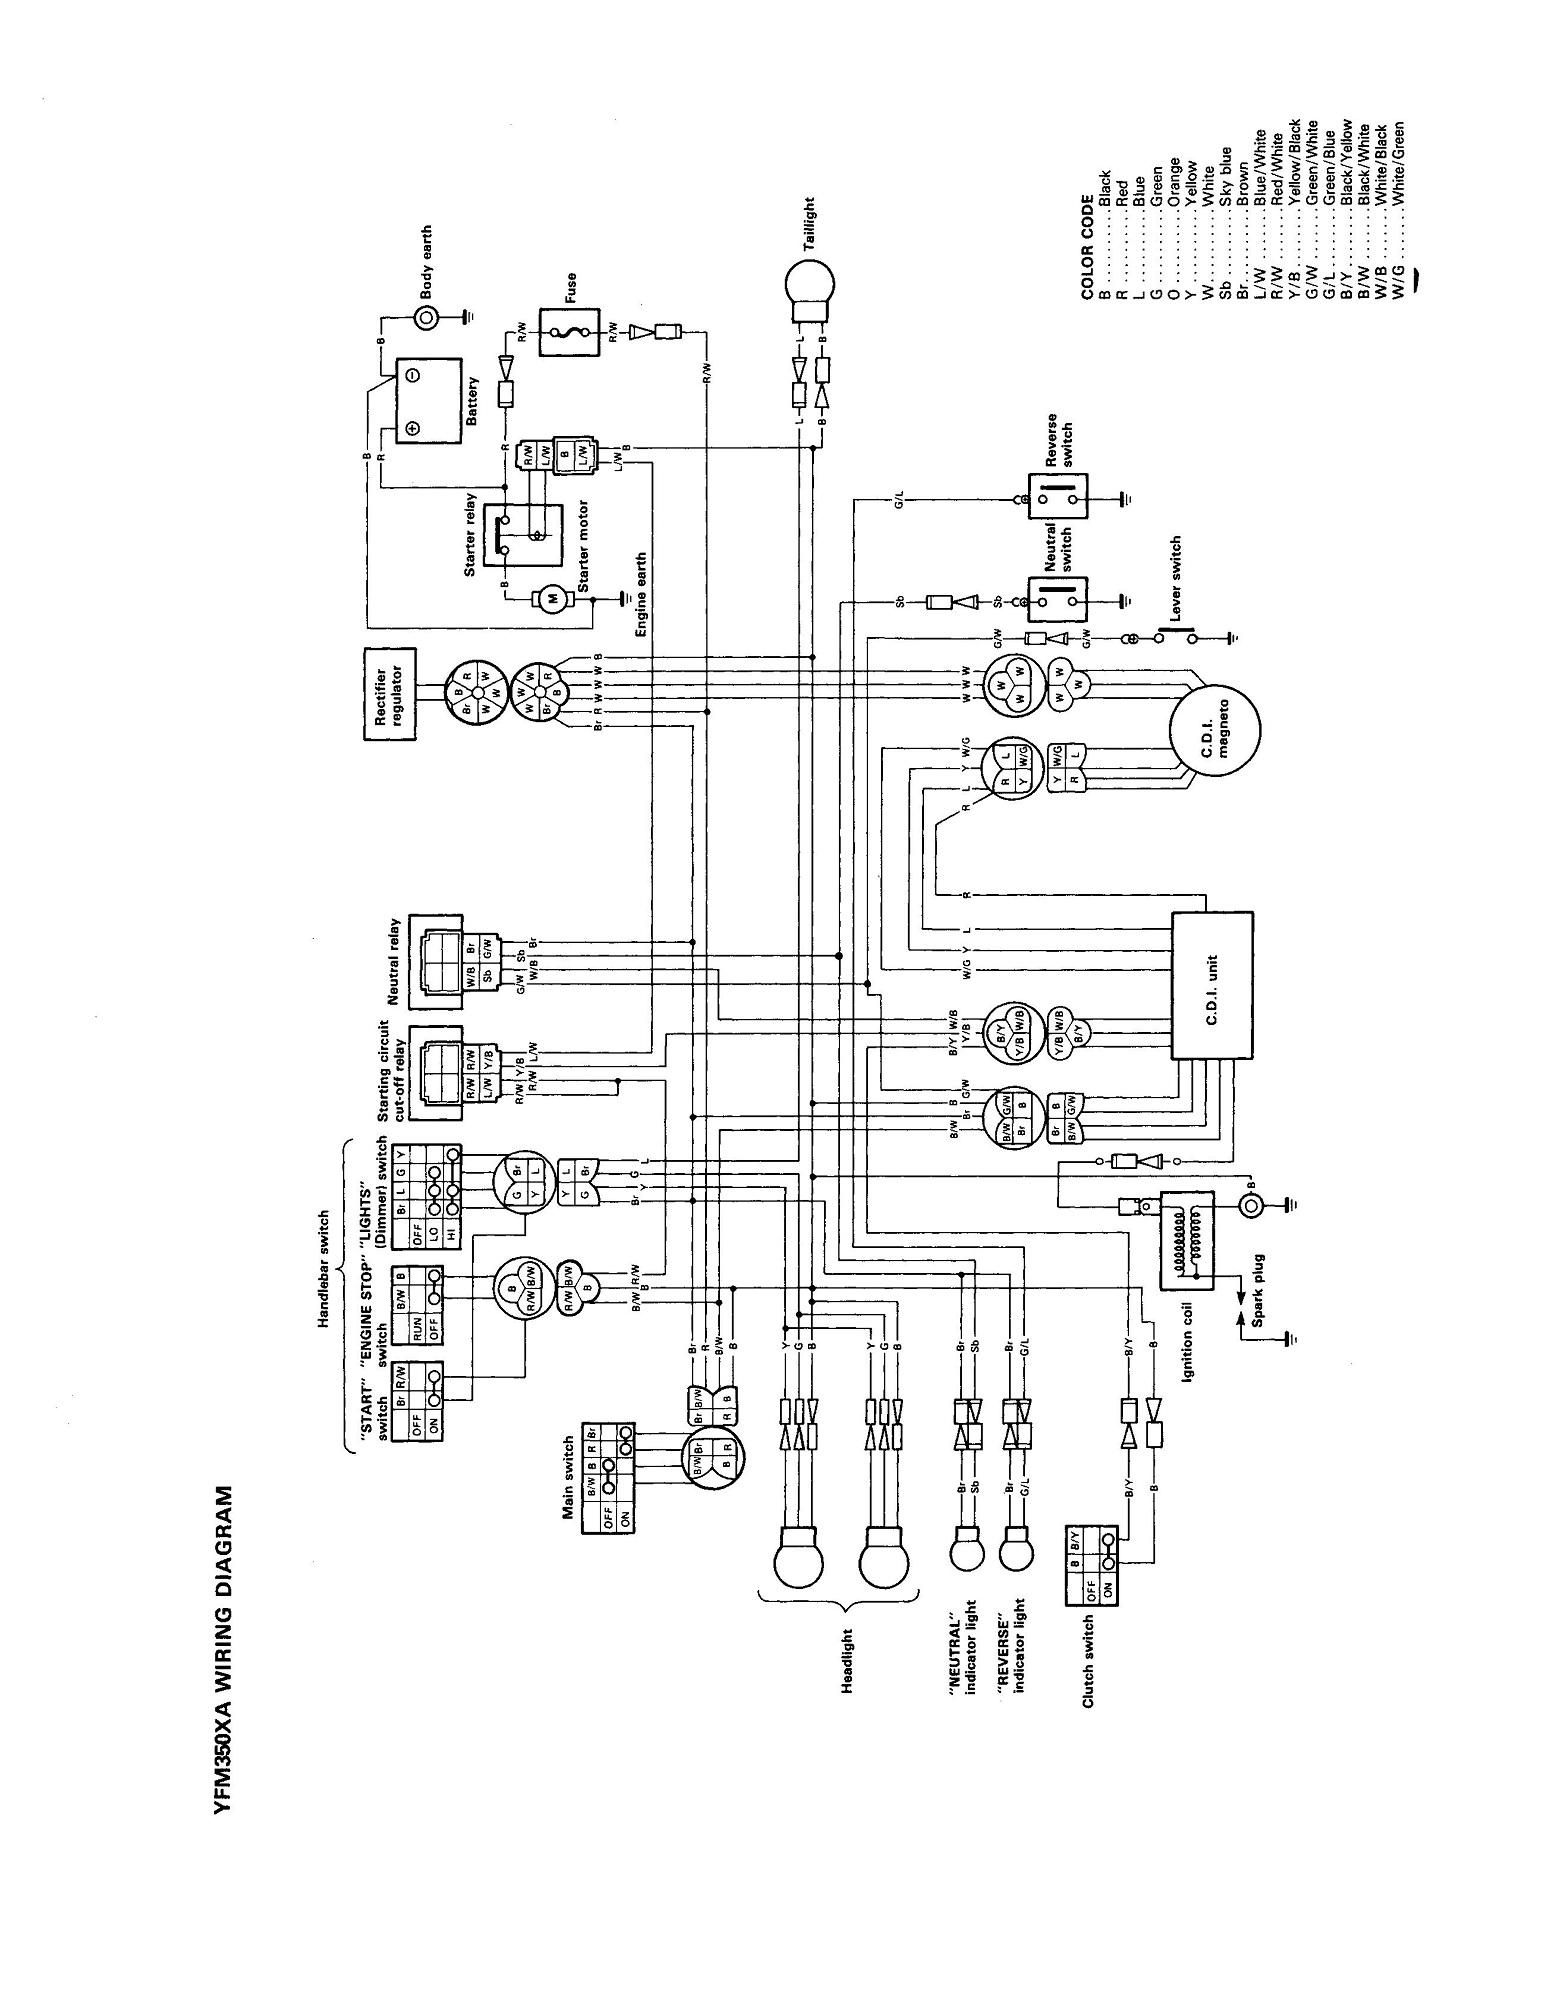 Yamaha Warrior 350X schaltplan - Gallery - dasquadforum.de - Quad ...